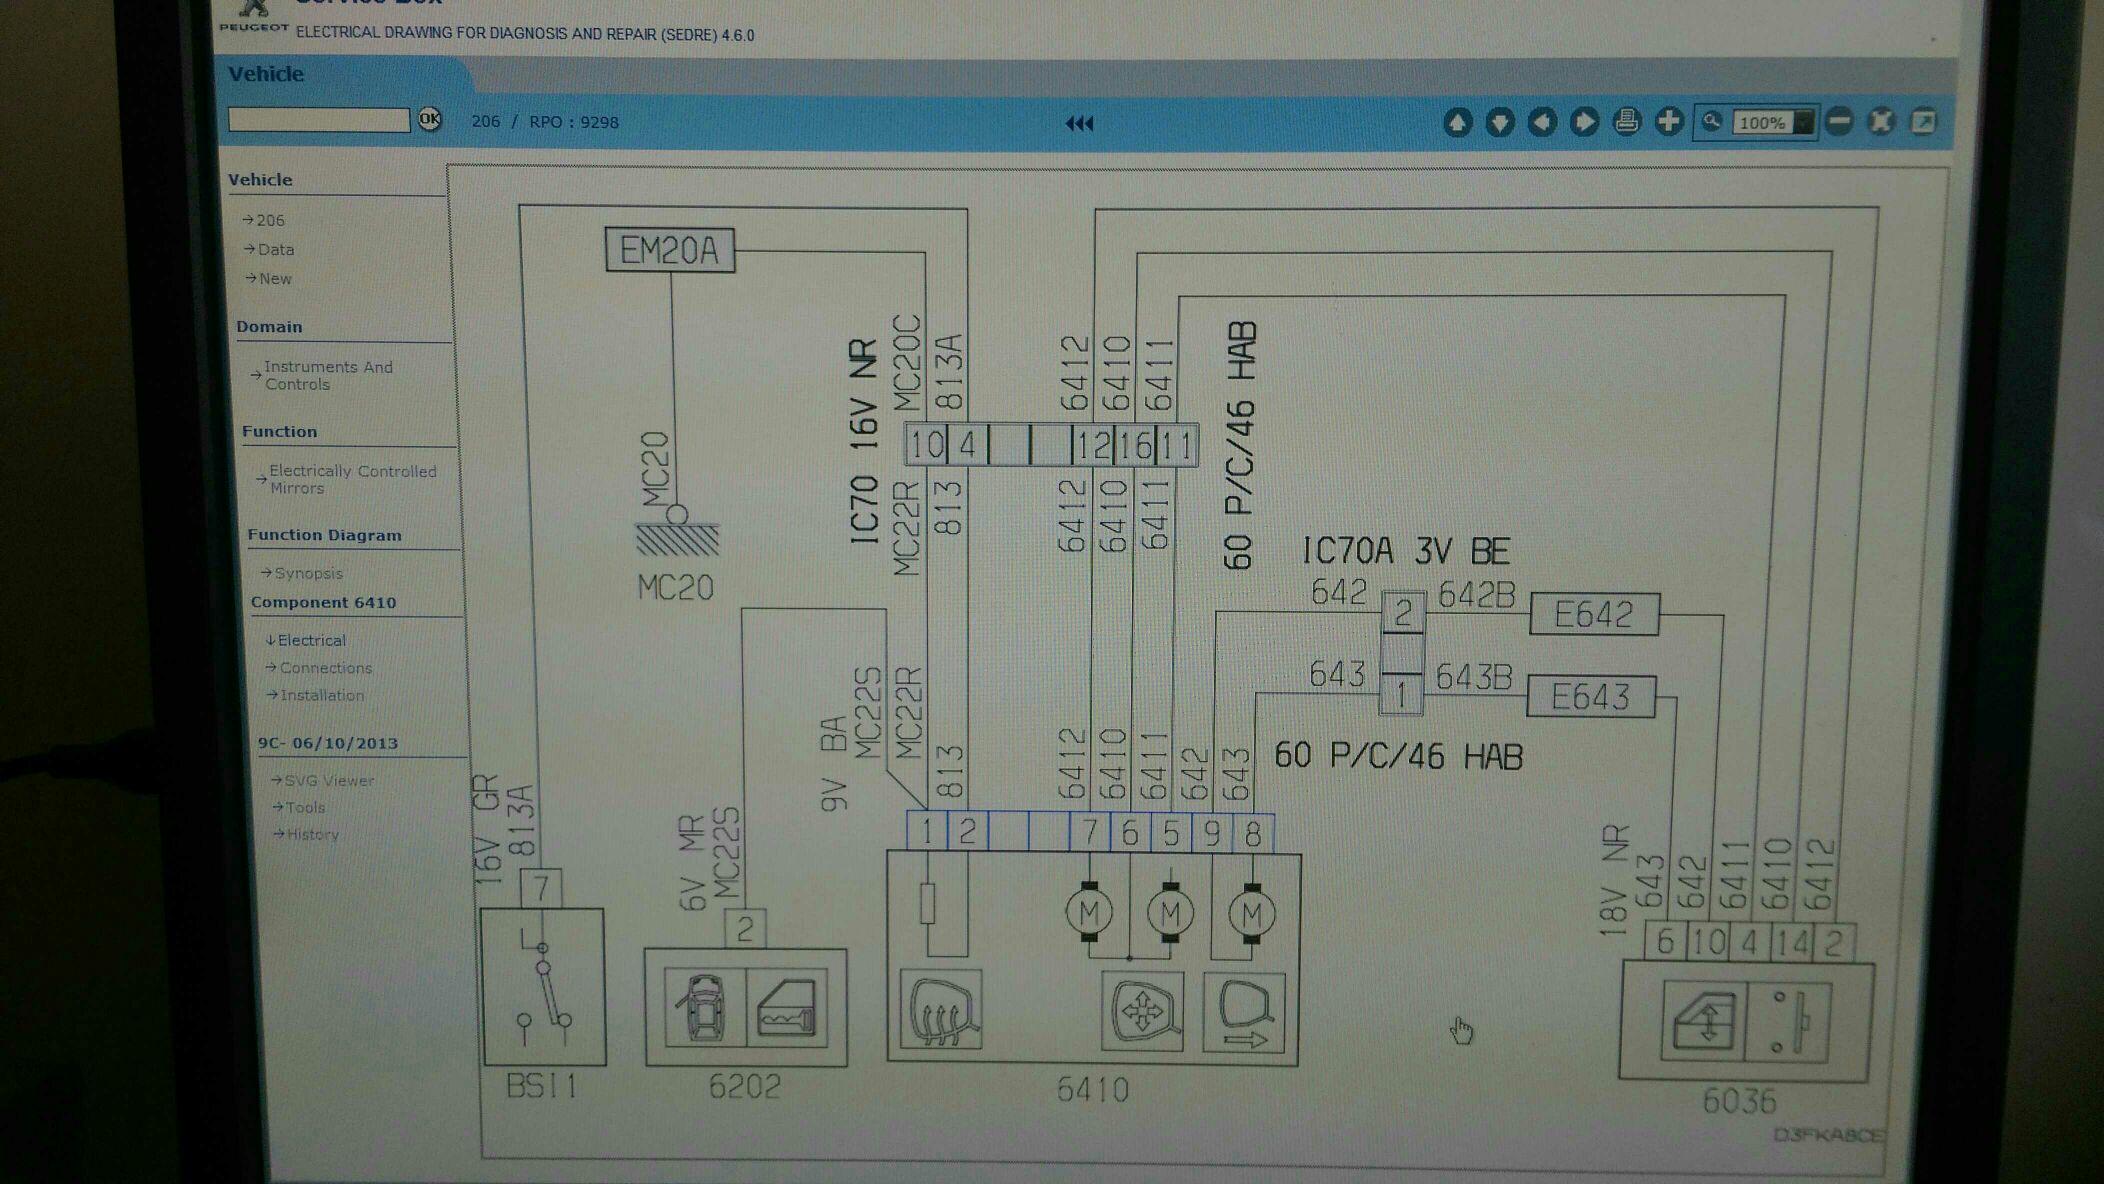 f265341fb9dd724f17c4cdbc7bba91c1.jpg